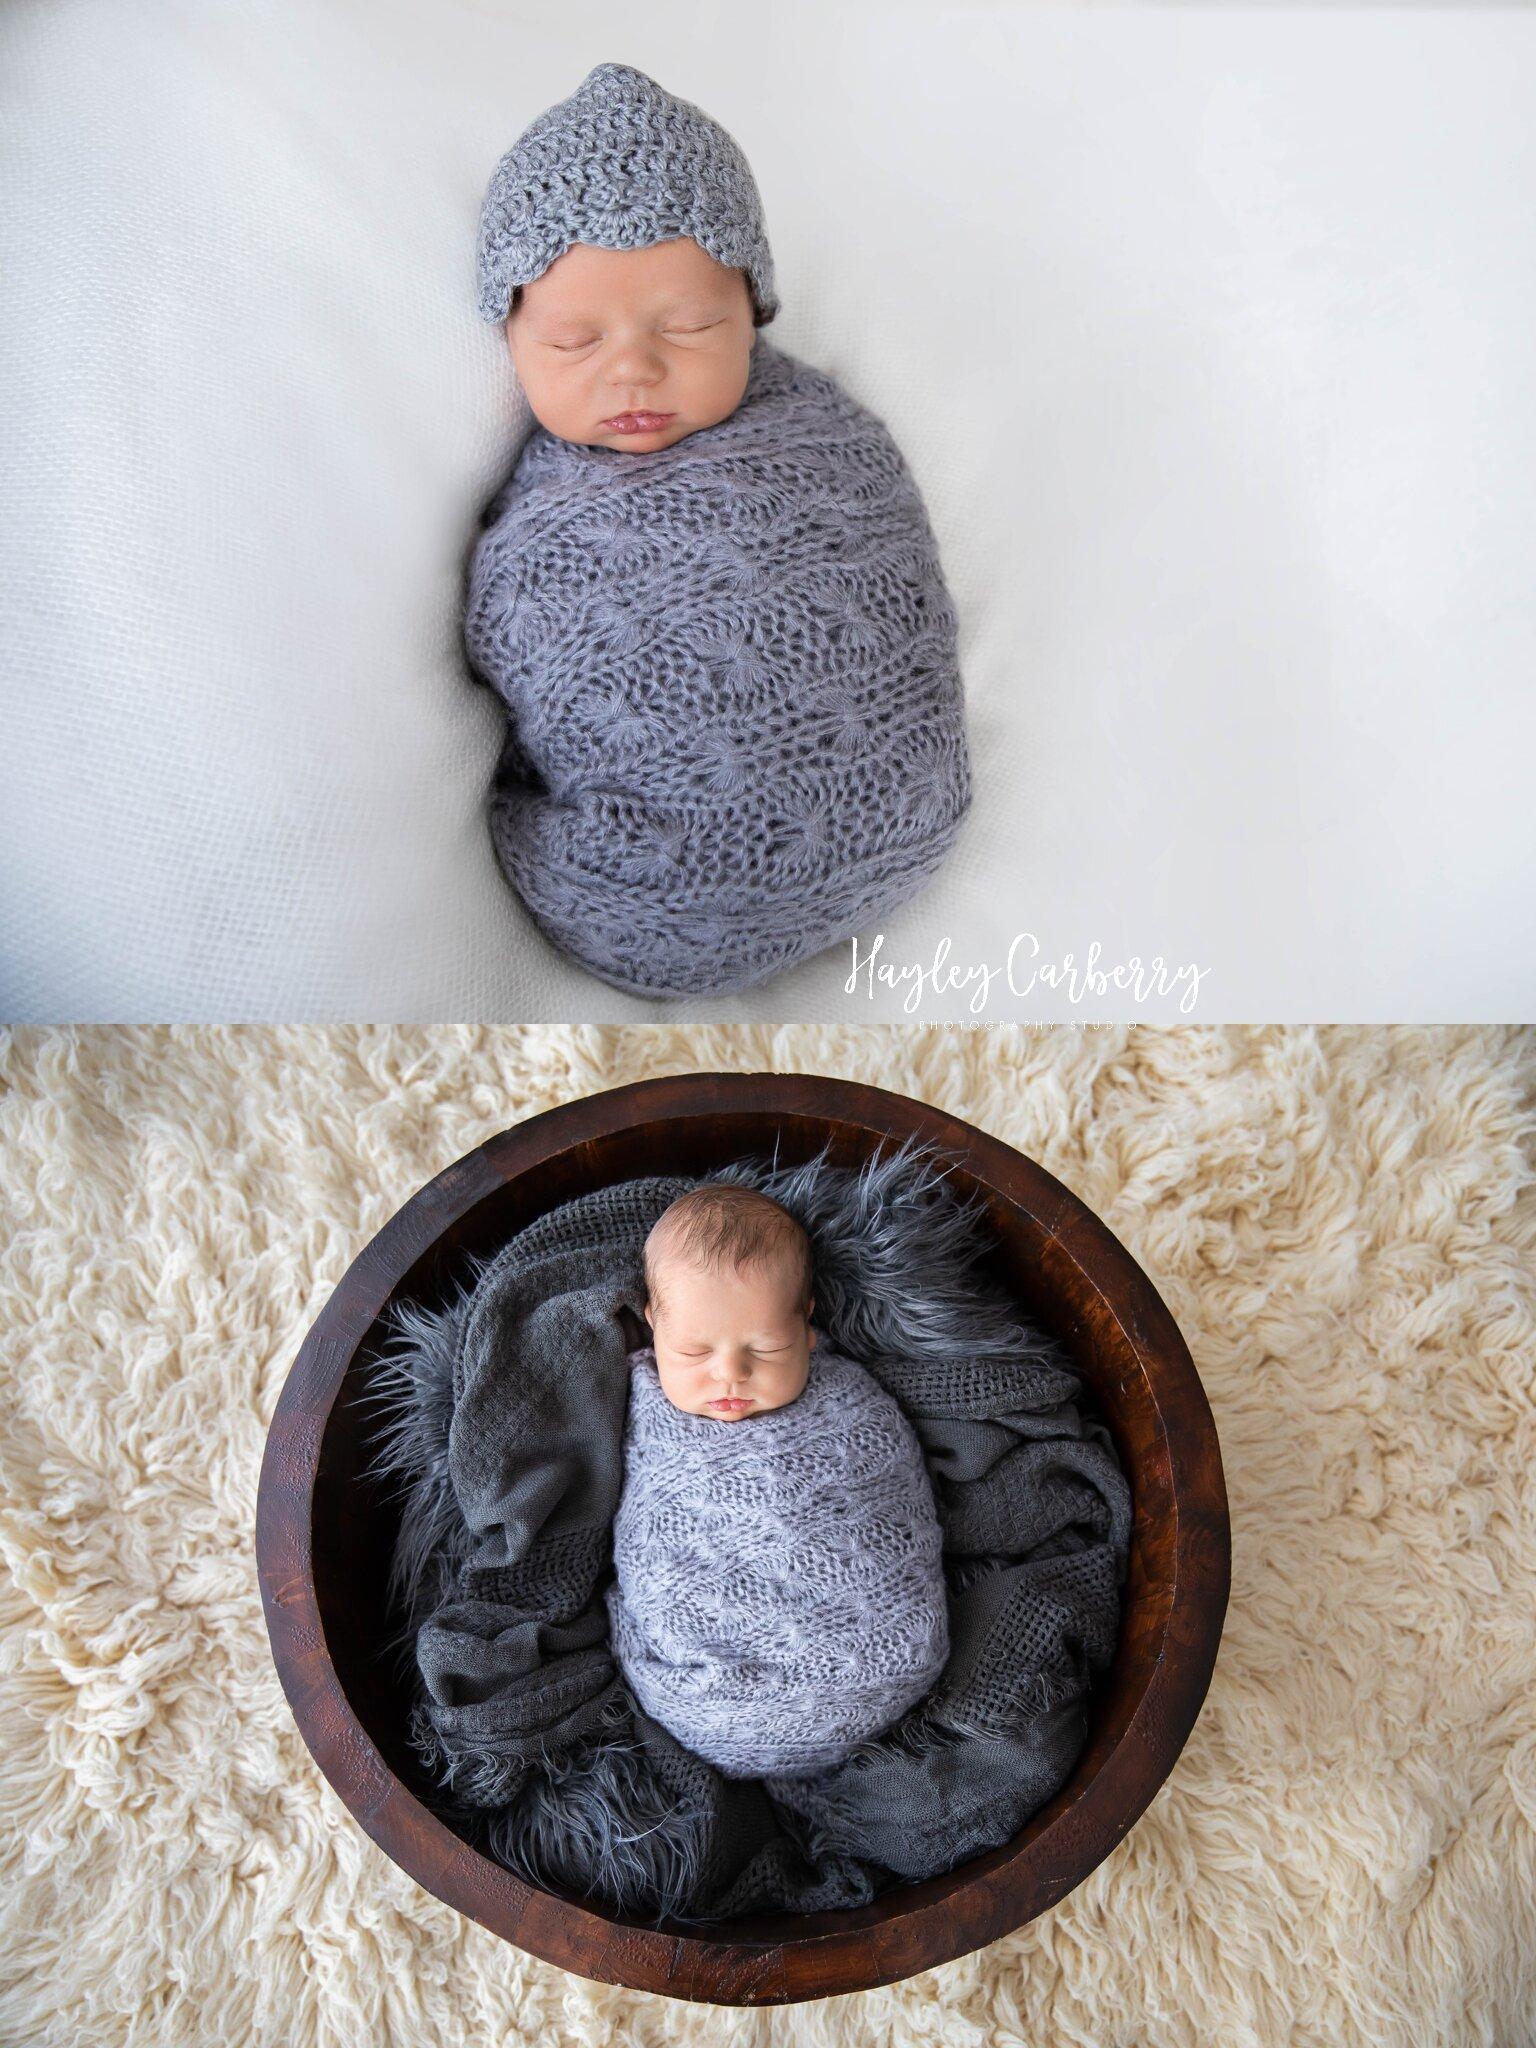 Canberra Family Baby Portrait Children Photographer (12 of 19)_WEB.jpg